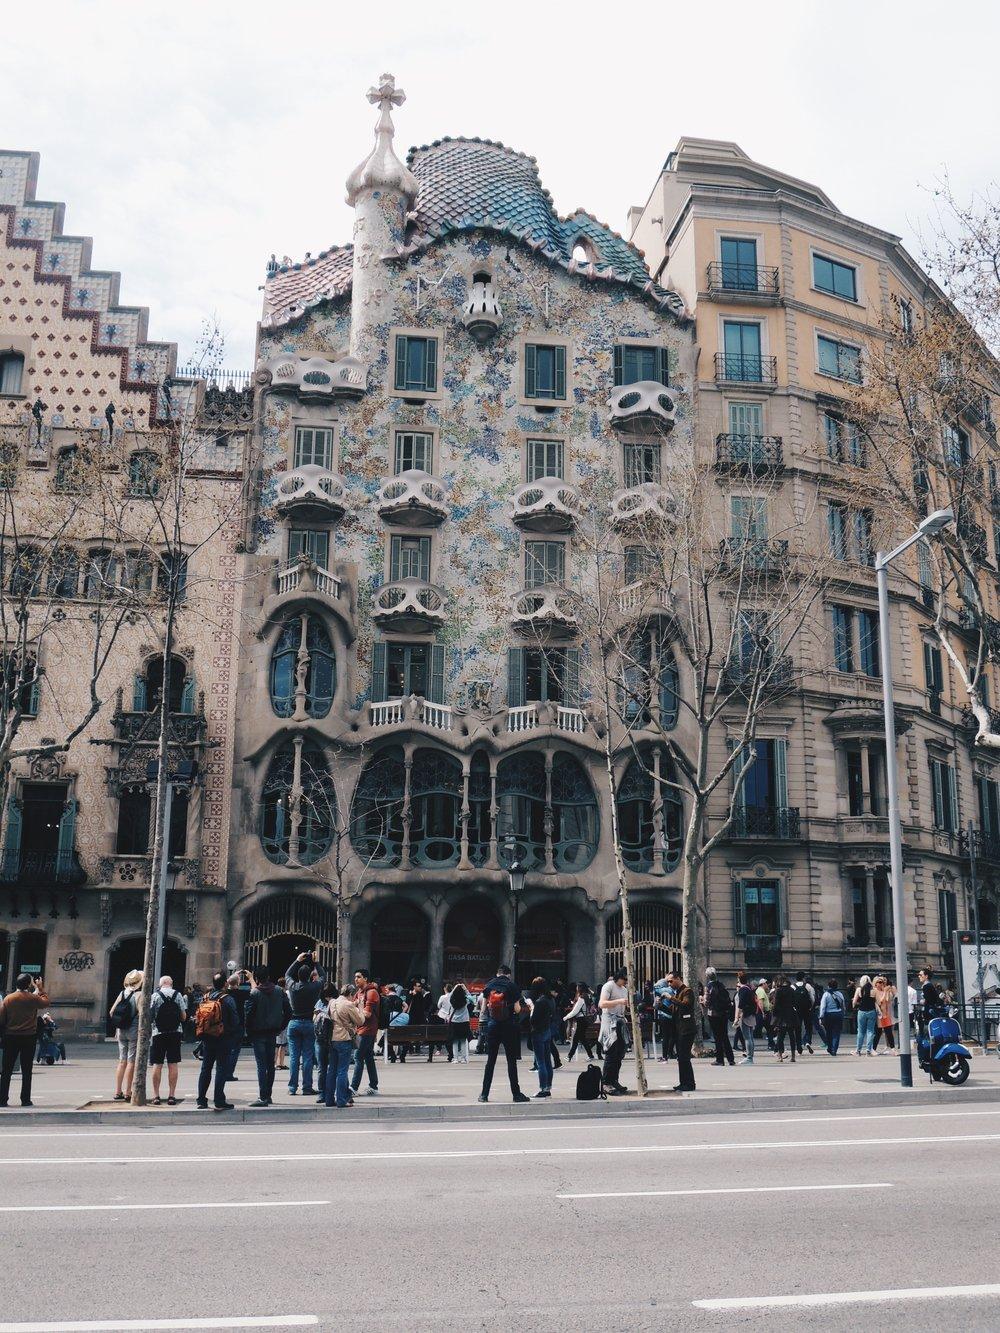 Another of Gaudí's works — Casa Batllo